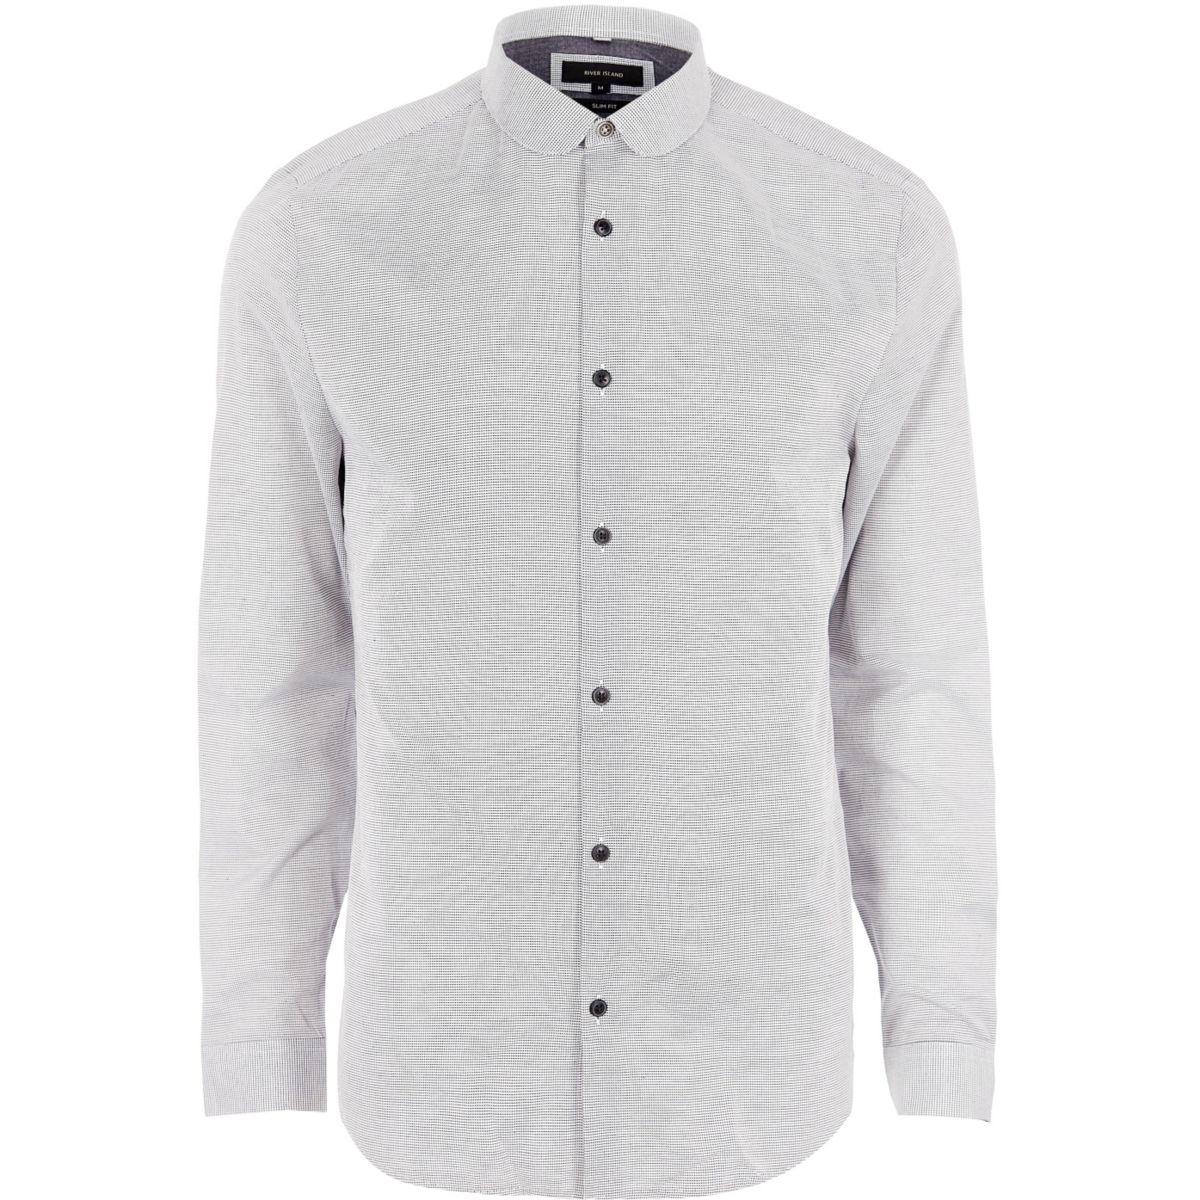 Grey penny collar slim fit shirt